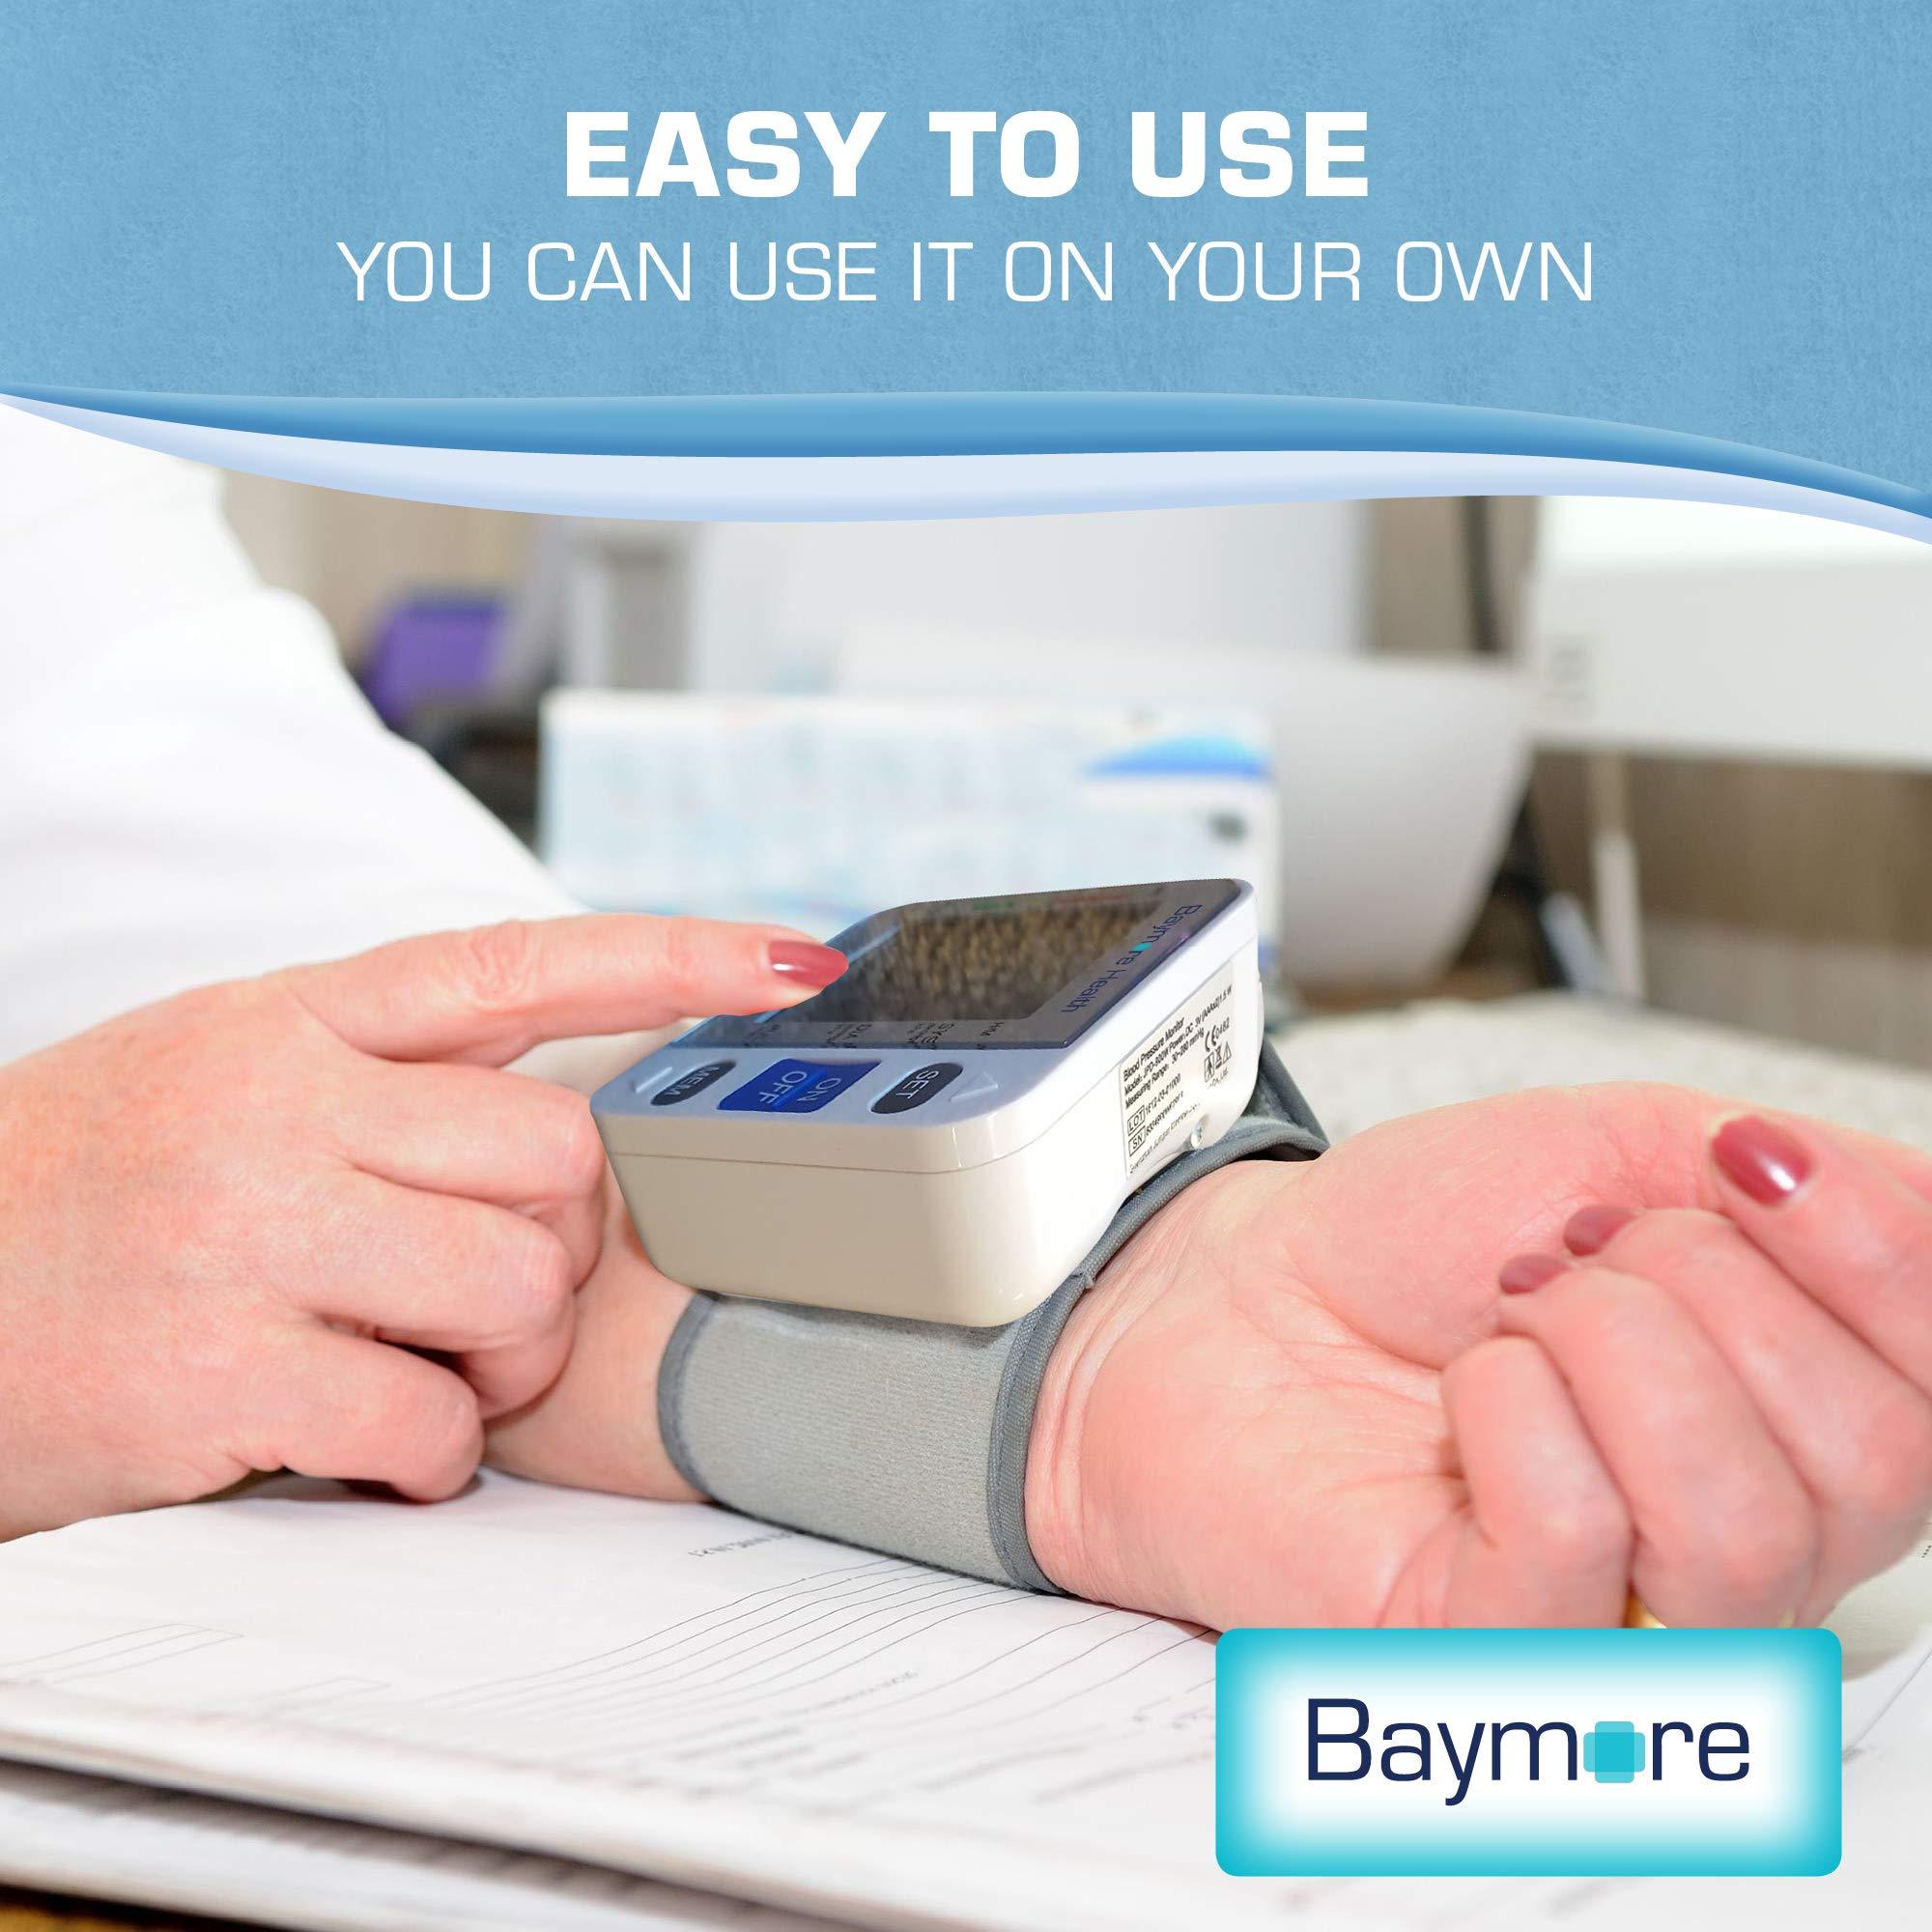 Baymore Digital Wrist Blood Pressure Monitor Cuff by Baymore (Image #2)